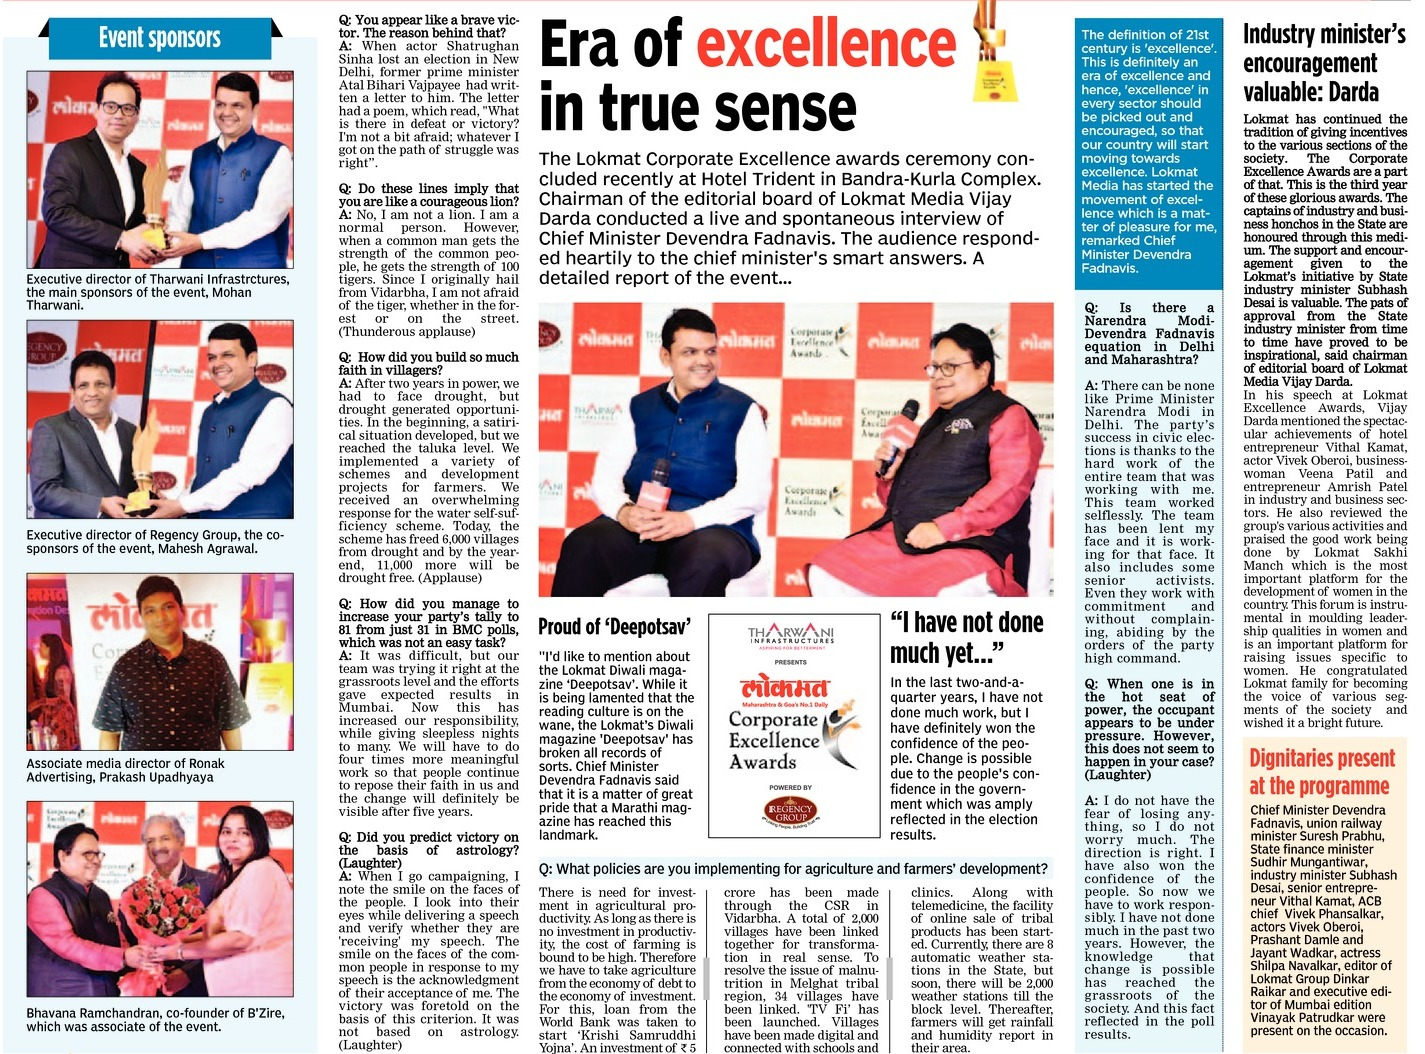 Era of excellence in true sense